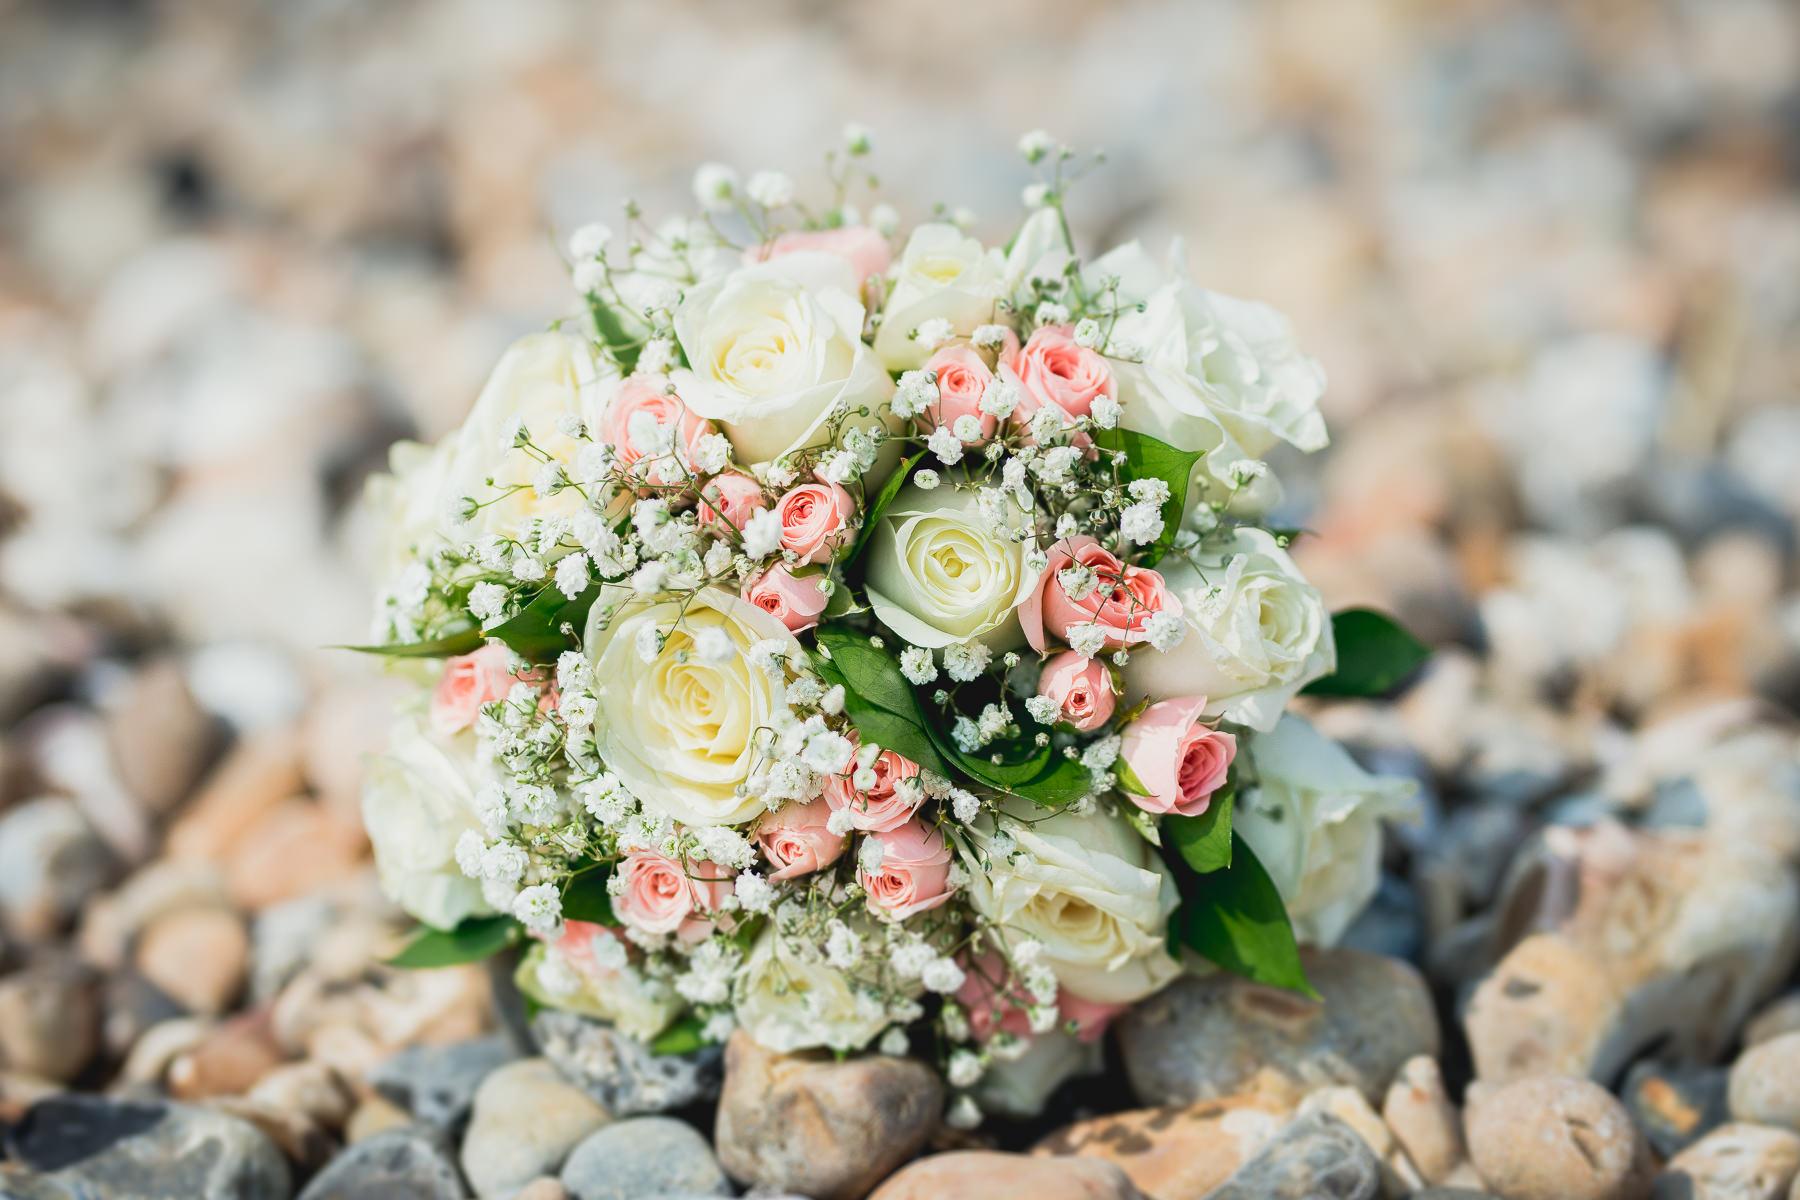 Wedding Bouquet Ieva Vilcinskaite Photo